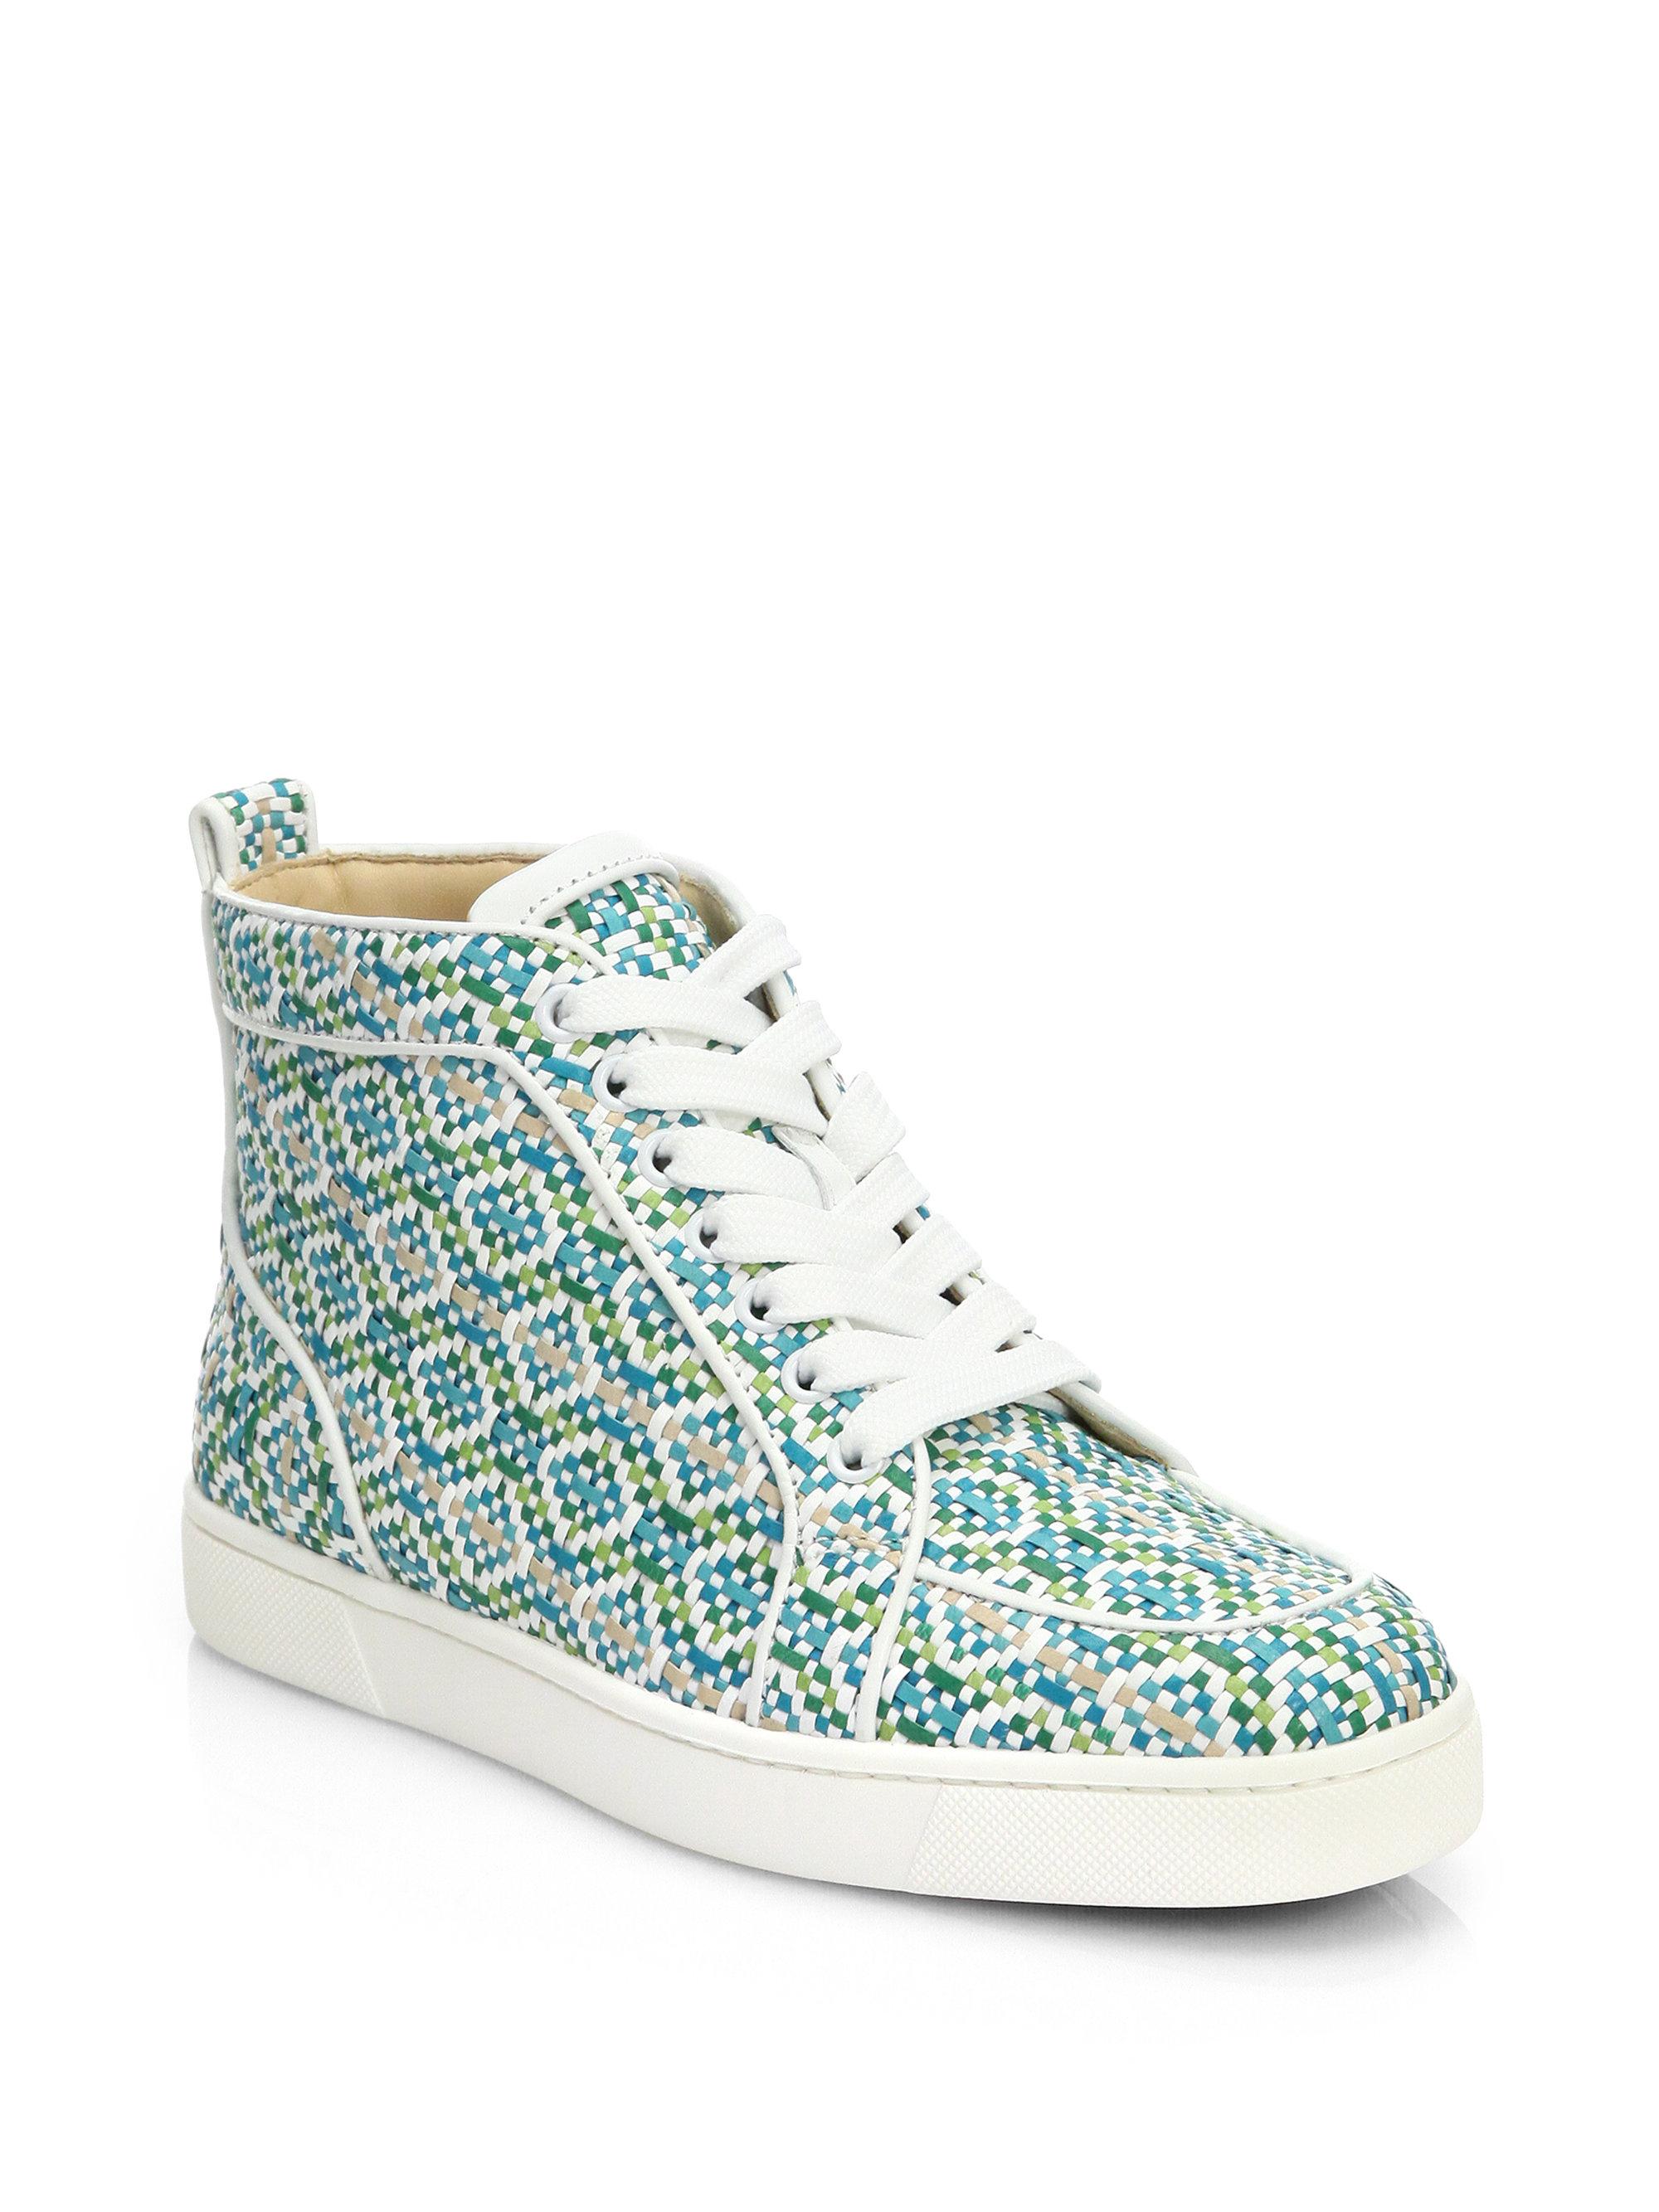 befabfee0ea Lyst - Christian Louboutin Rantus Woven Leather Hightop Sneakers